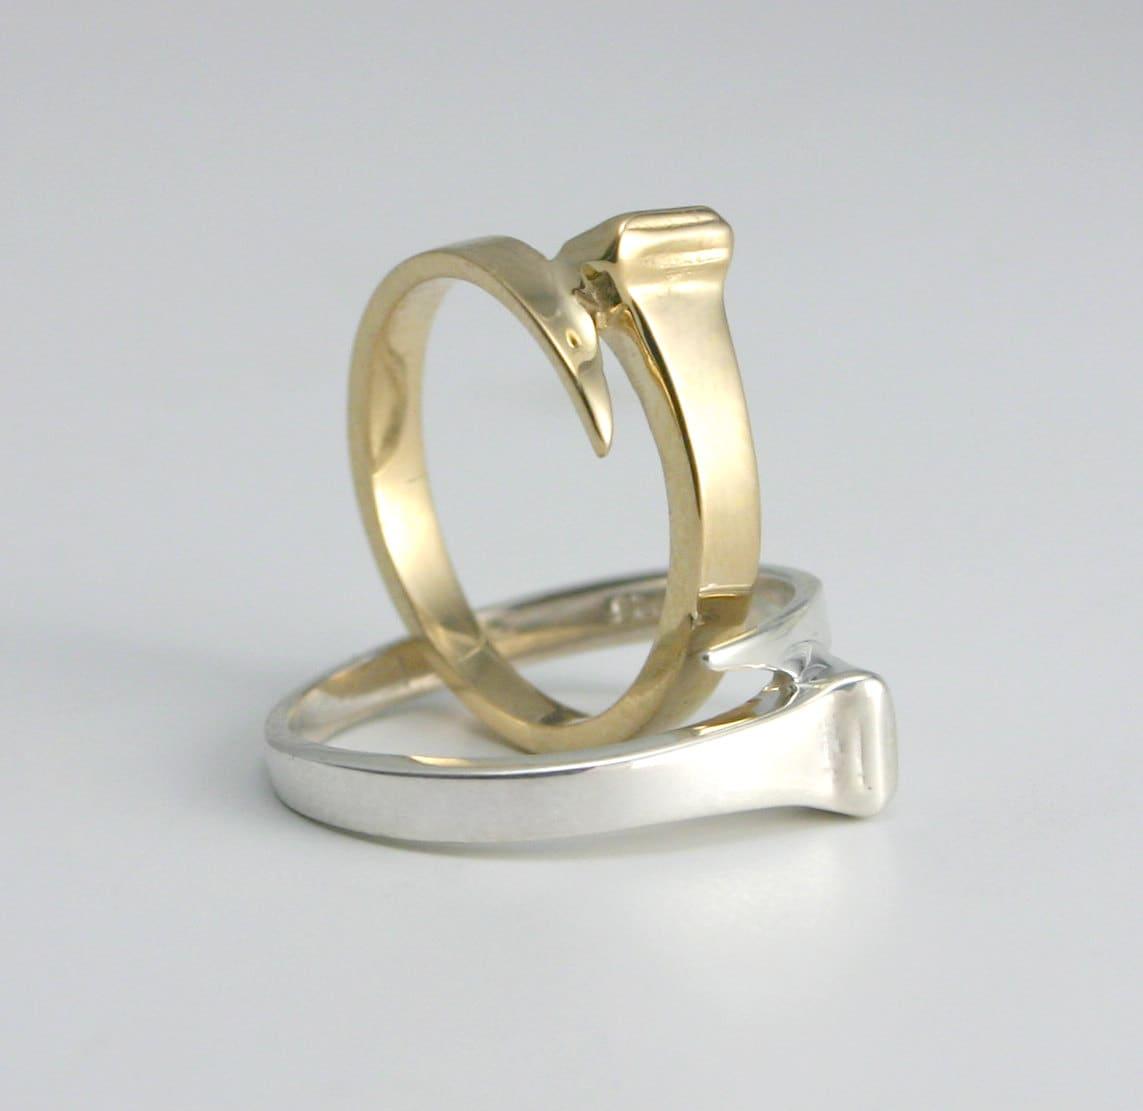 equestrian horseshoe nail adjustable ring horseshoe jewelry